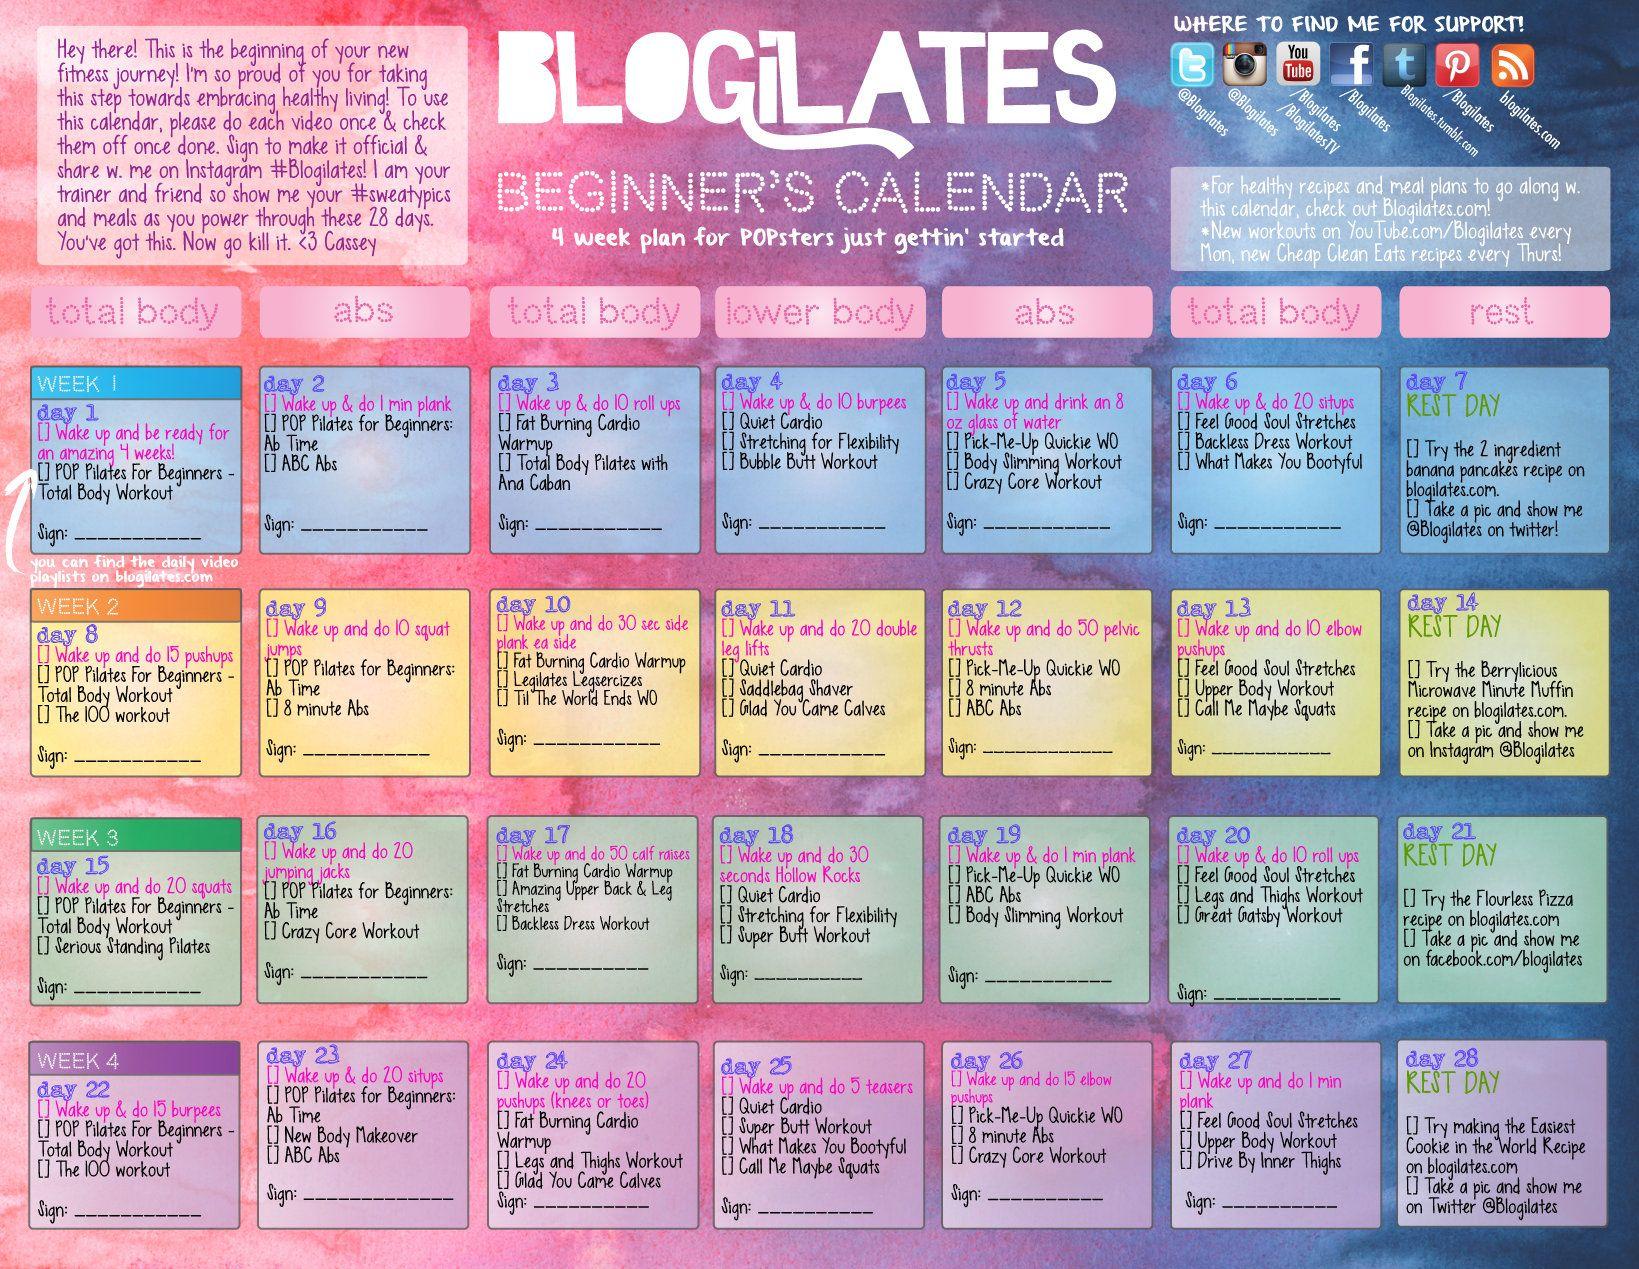 blogilates beginners calendar!!! Free youtube workouts from Cassey